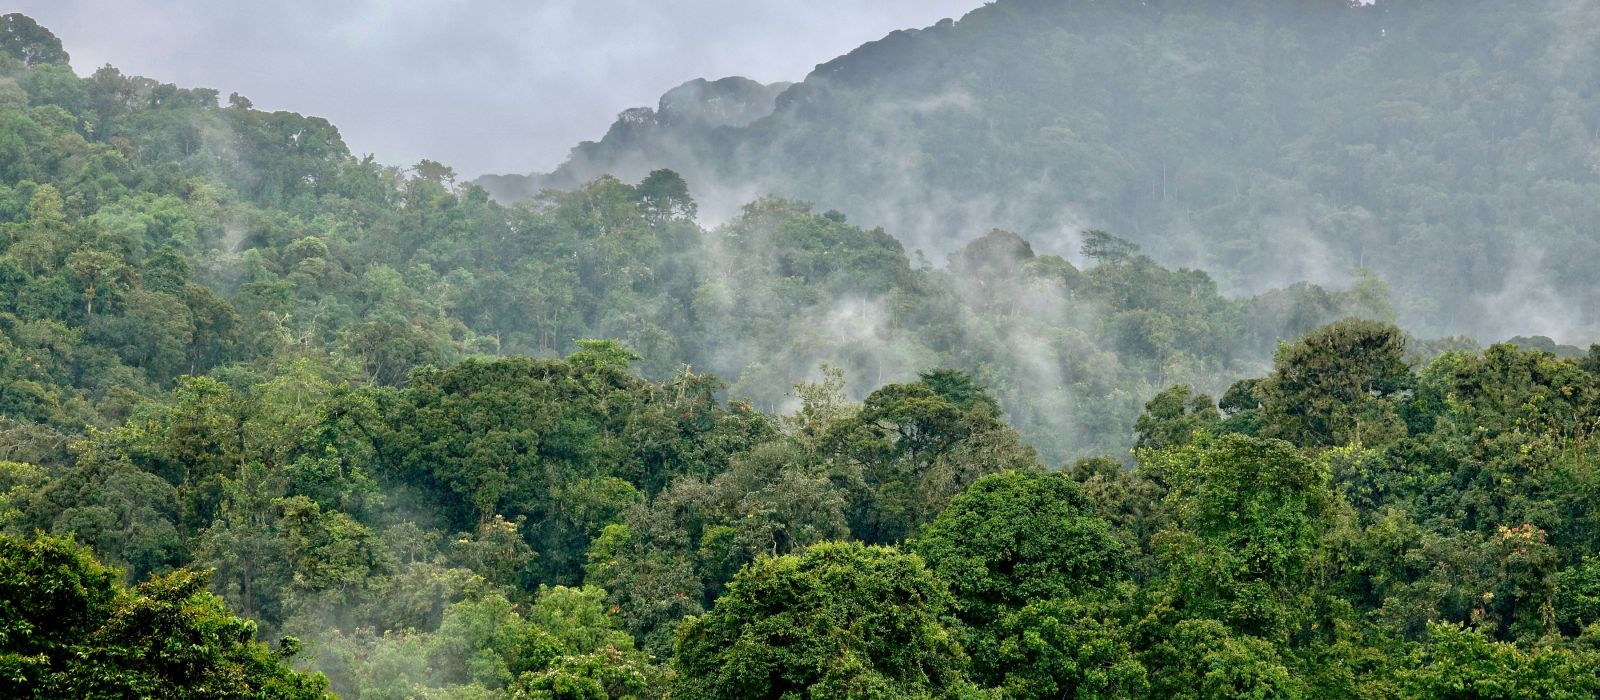 Rainforest Nyungwe, Rwanda, Africa, Landscape